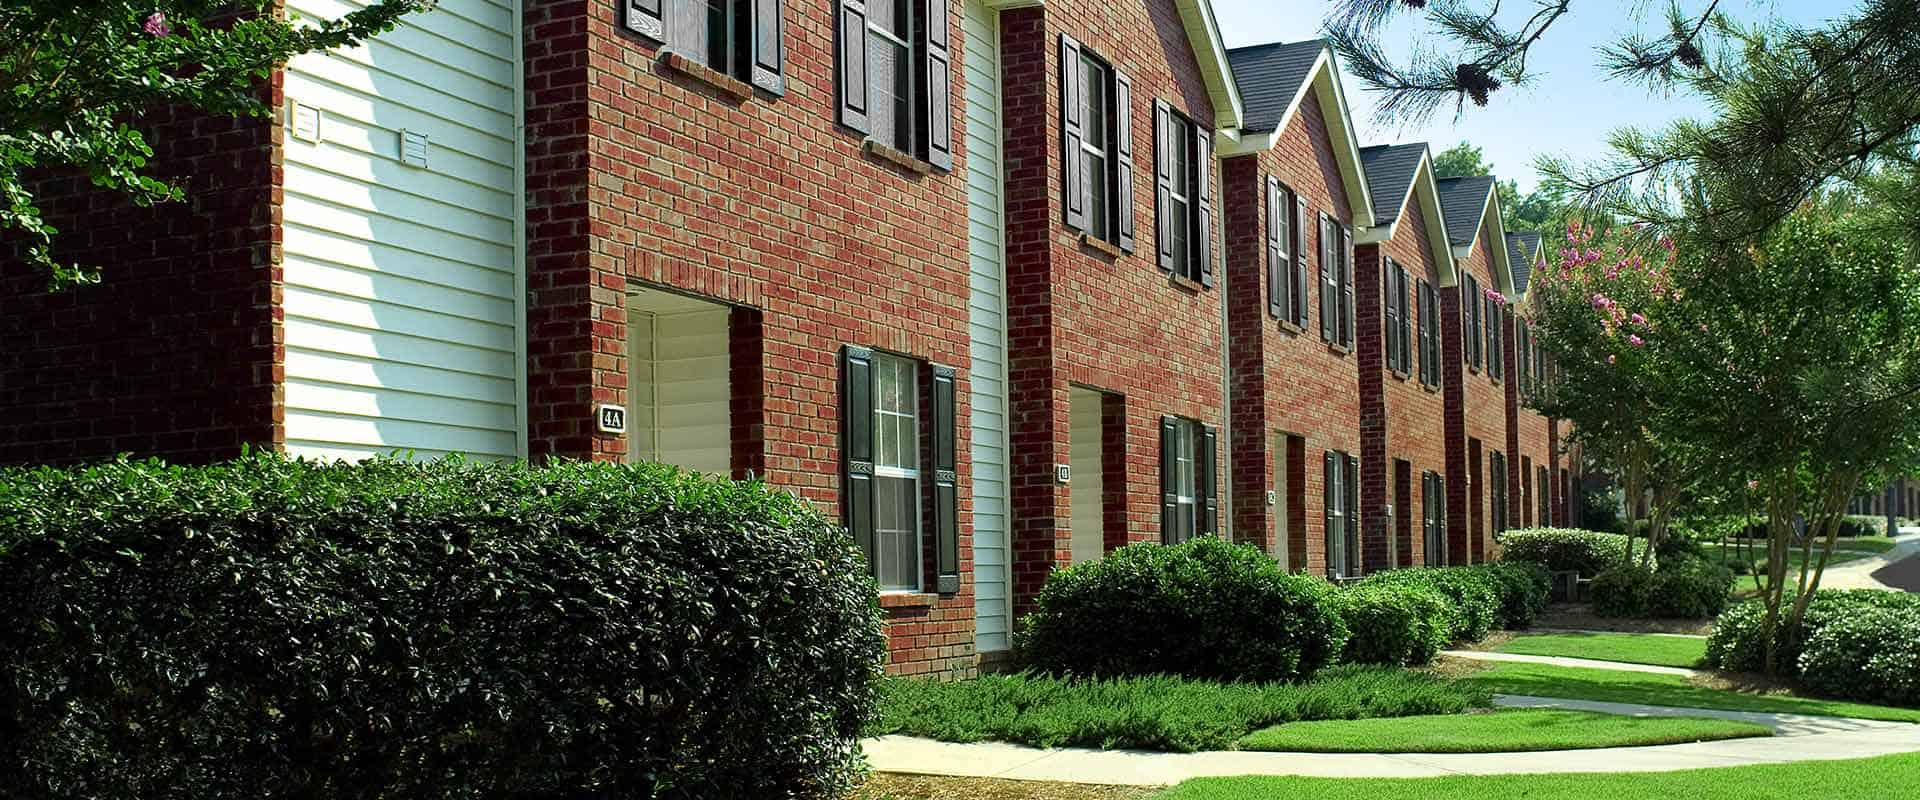 Exterior Views of Main Street Apartments